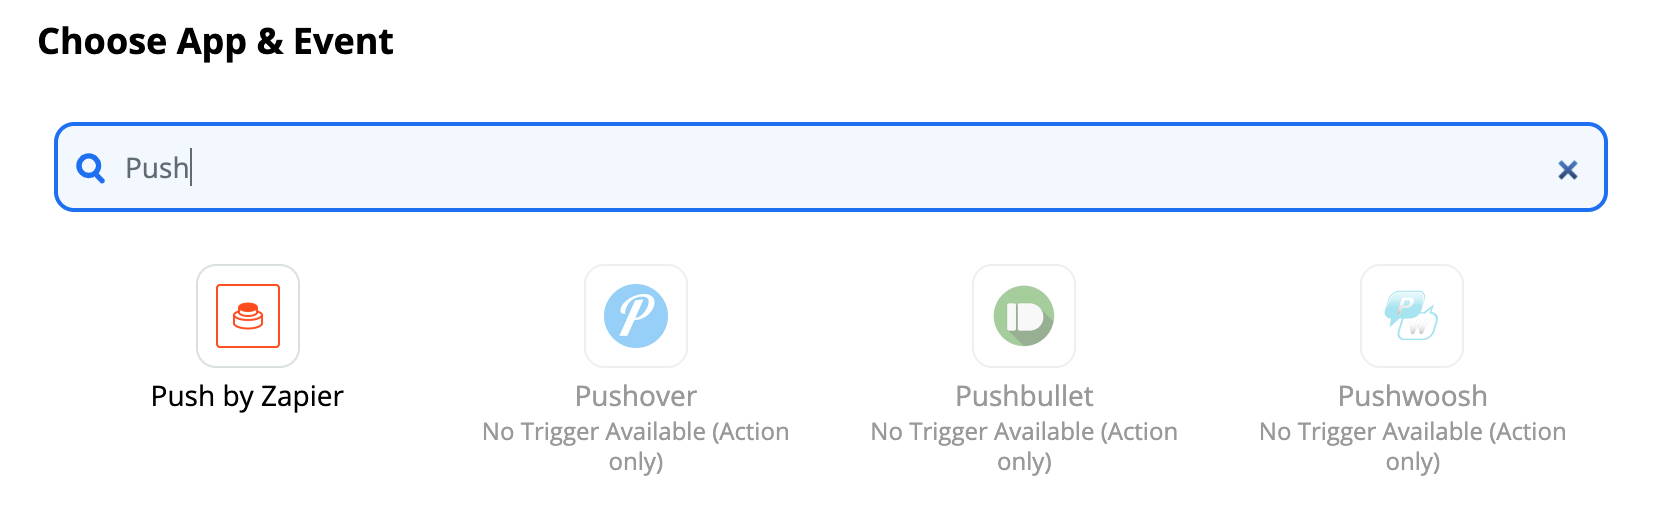 Push by Zapier